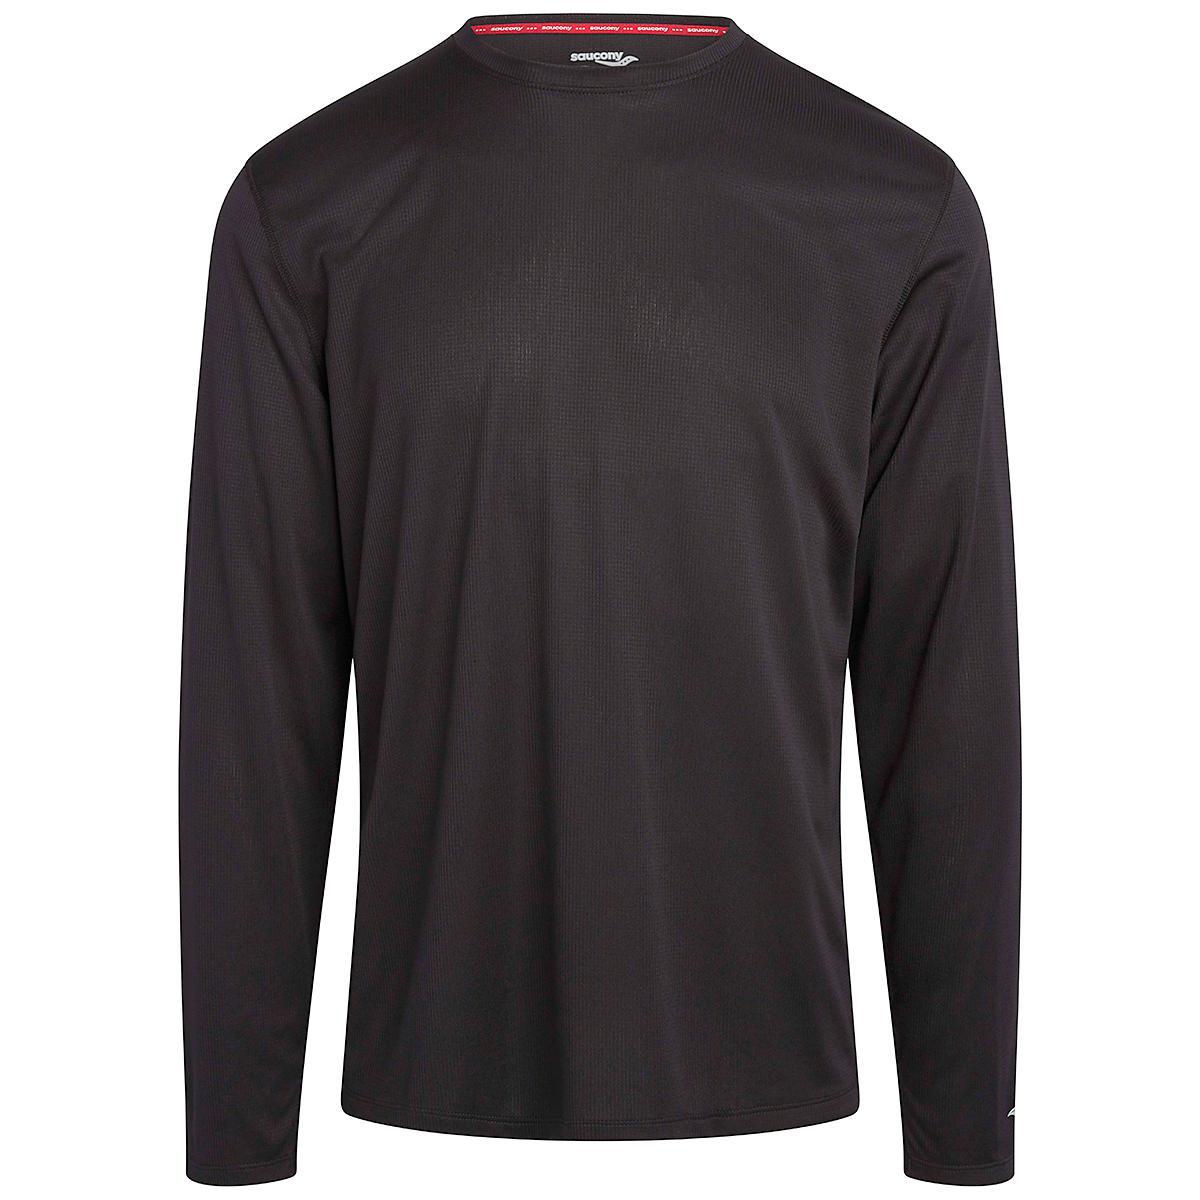 Men's Saucony Stopwatch Long Sleeve - Color: Black - Size: S, Black, large, image 3